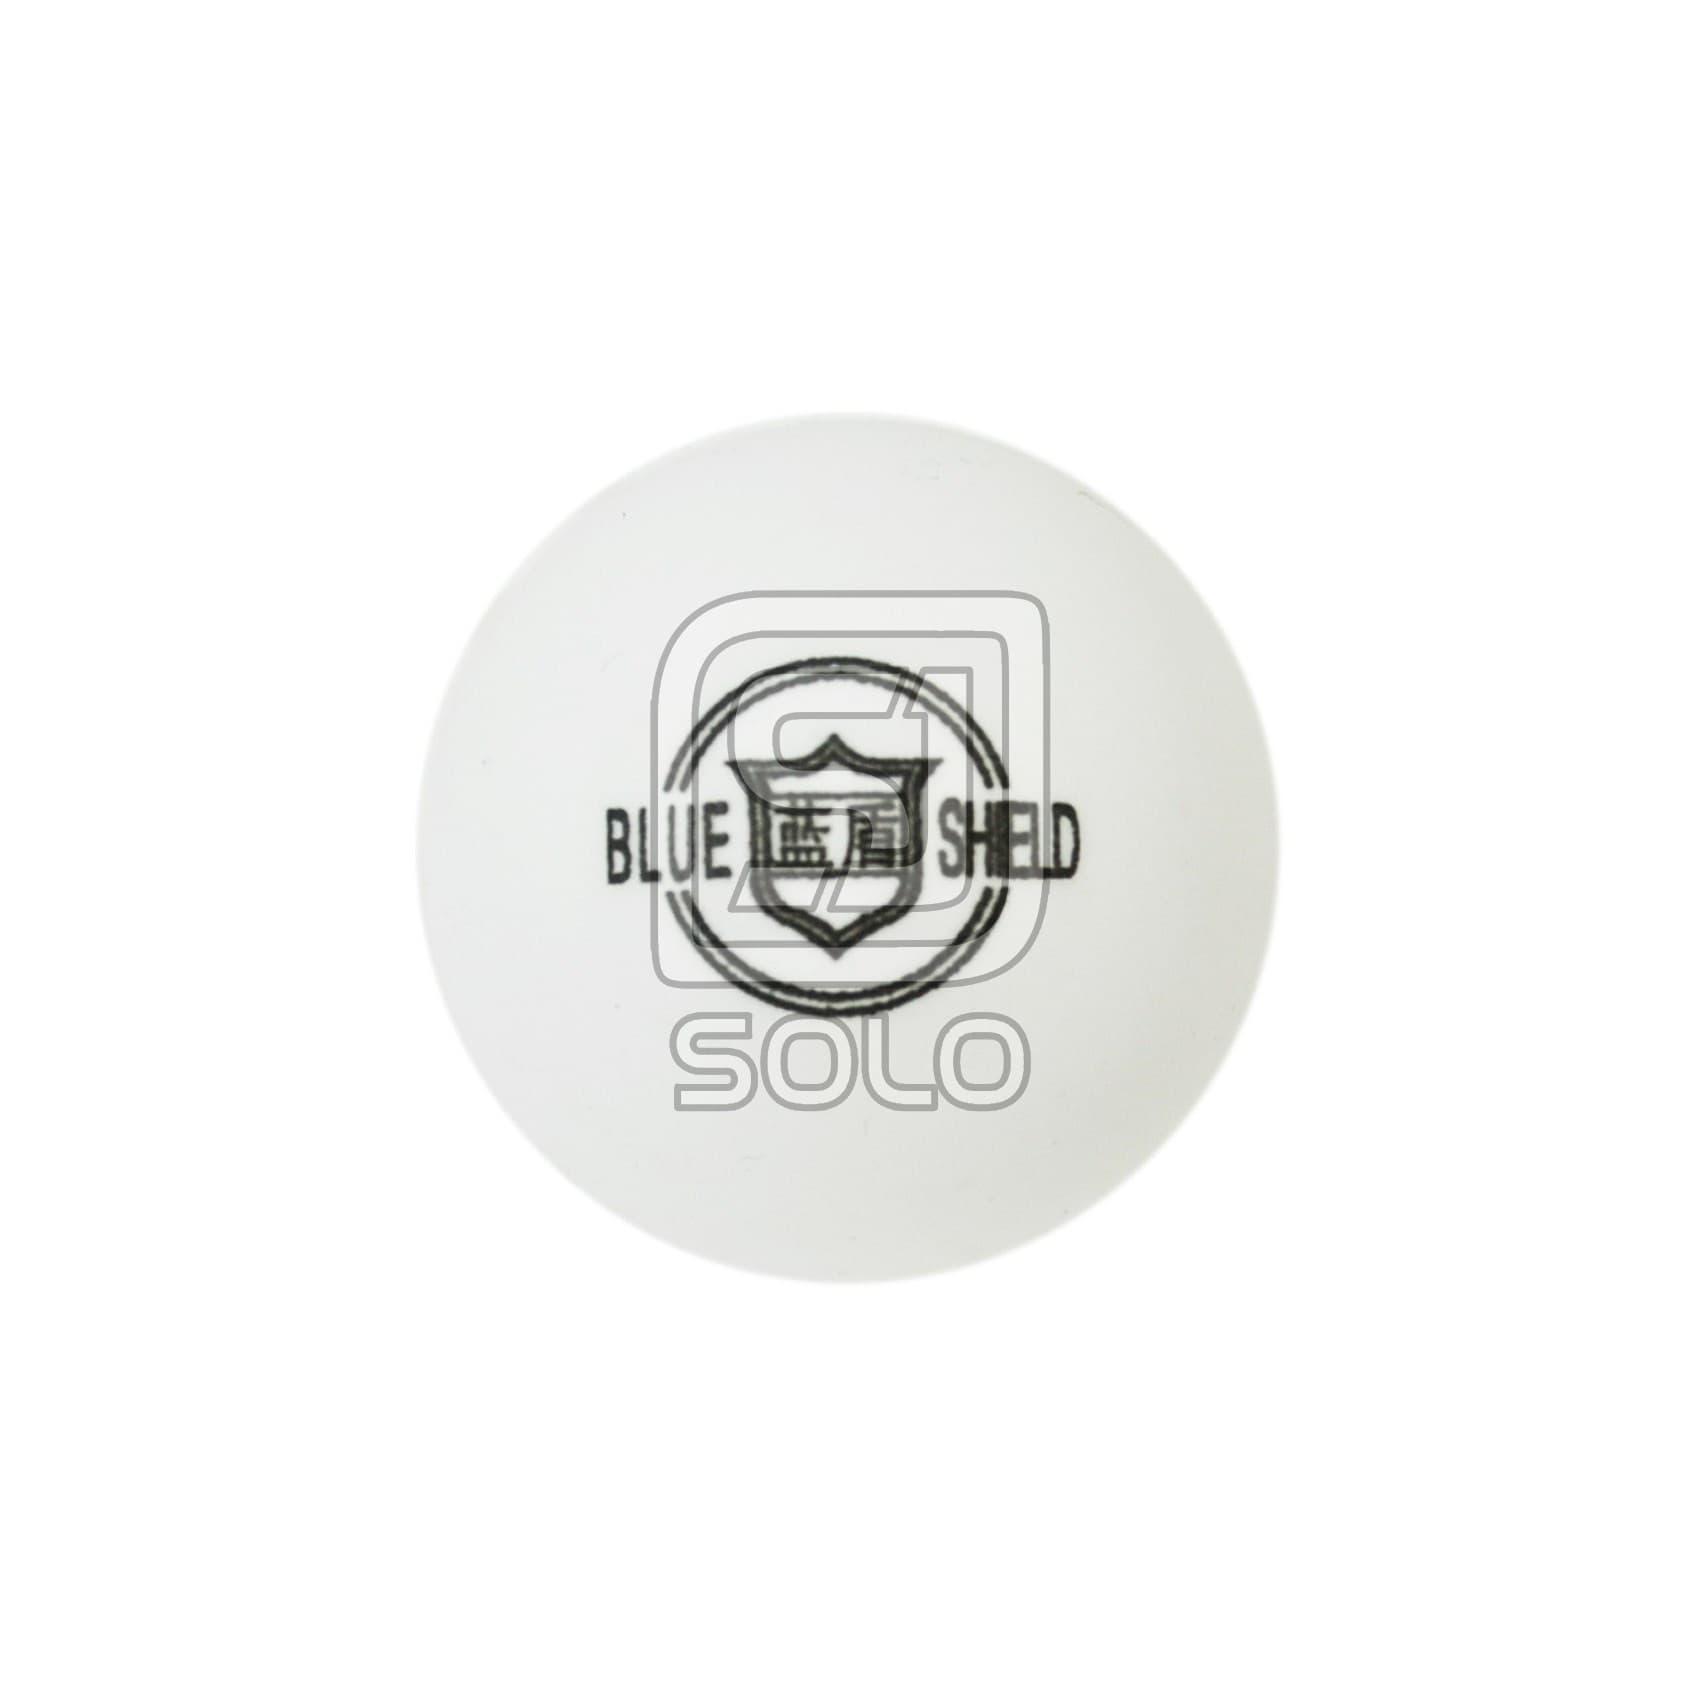 Jual Bola Ping Pong Shield 101 Tennis Tenis Meja Isi 6